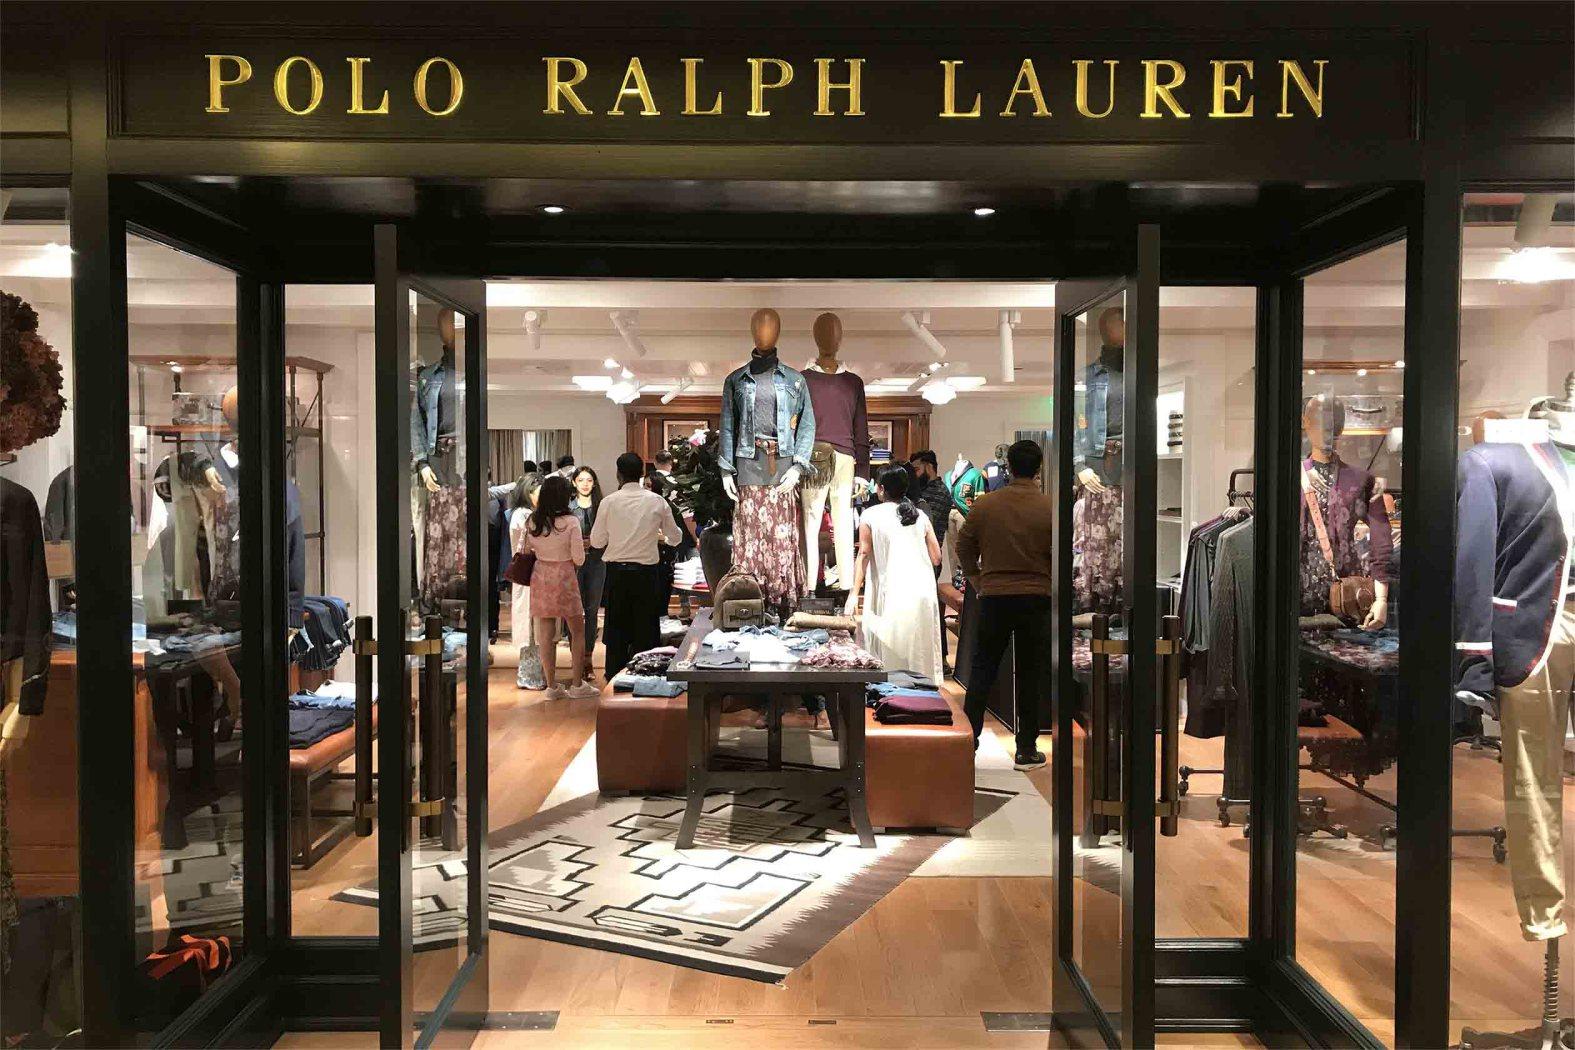 Delhi At Delhi's Emporio Lauren Polo Ralph Store Dlf 354ARLqScj